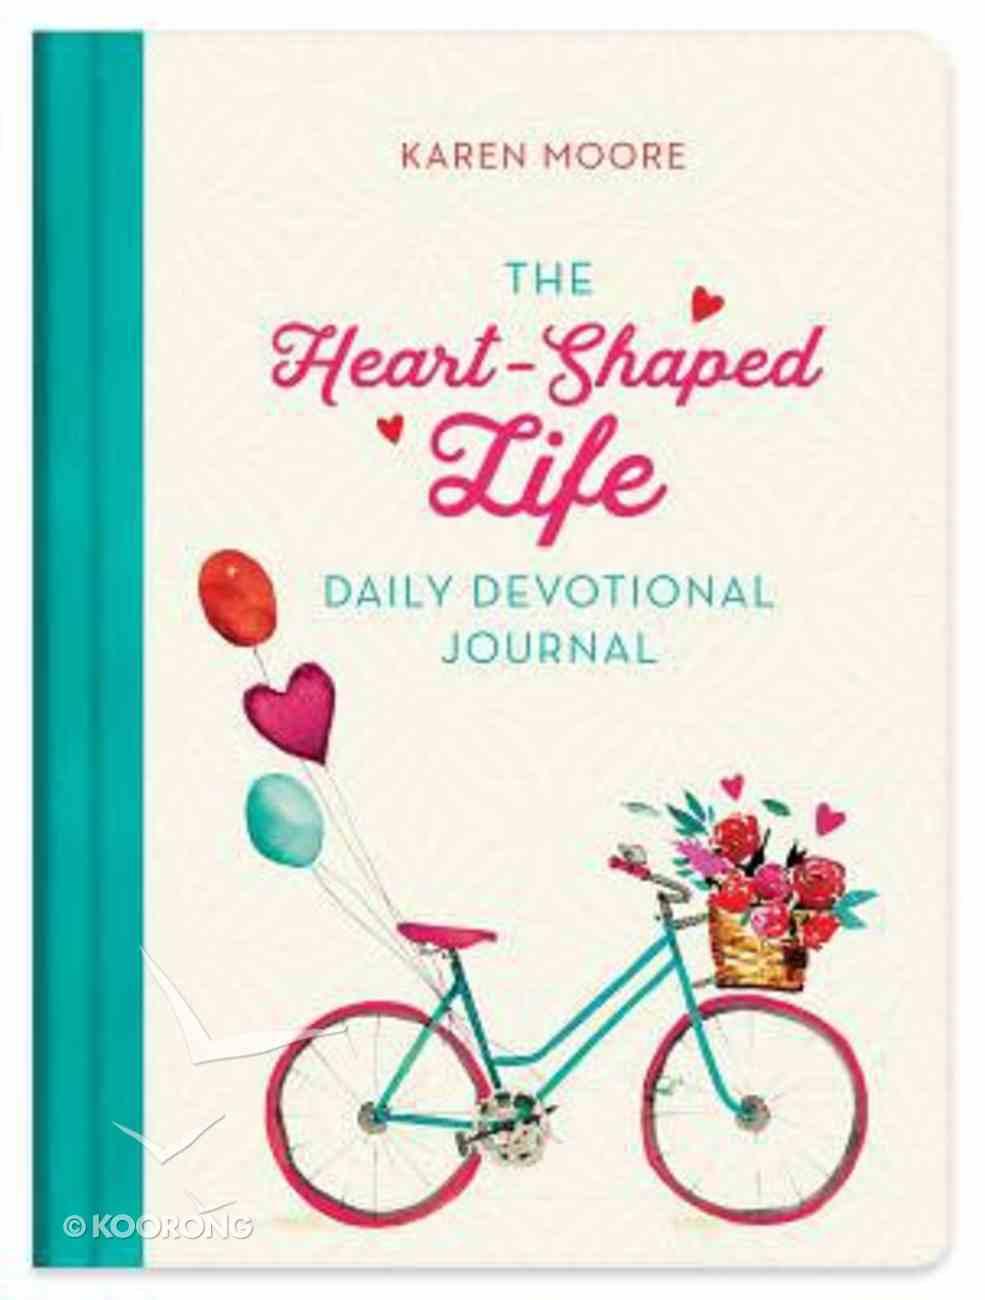 The Heart-Shaped Life Daily Devotional Journal Hardback